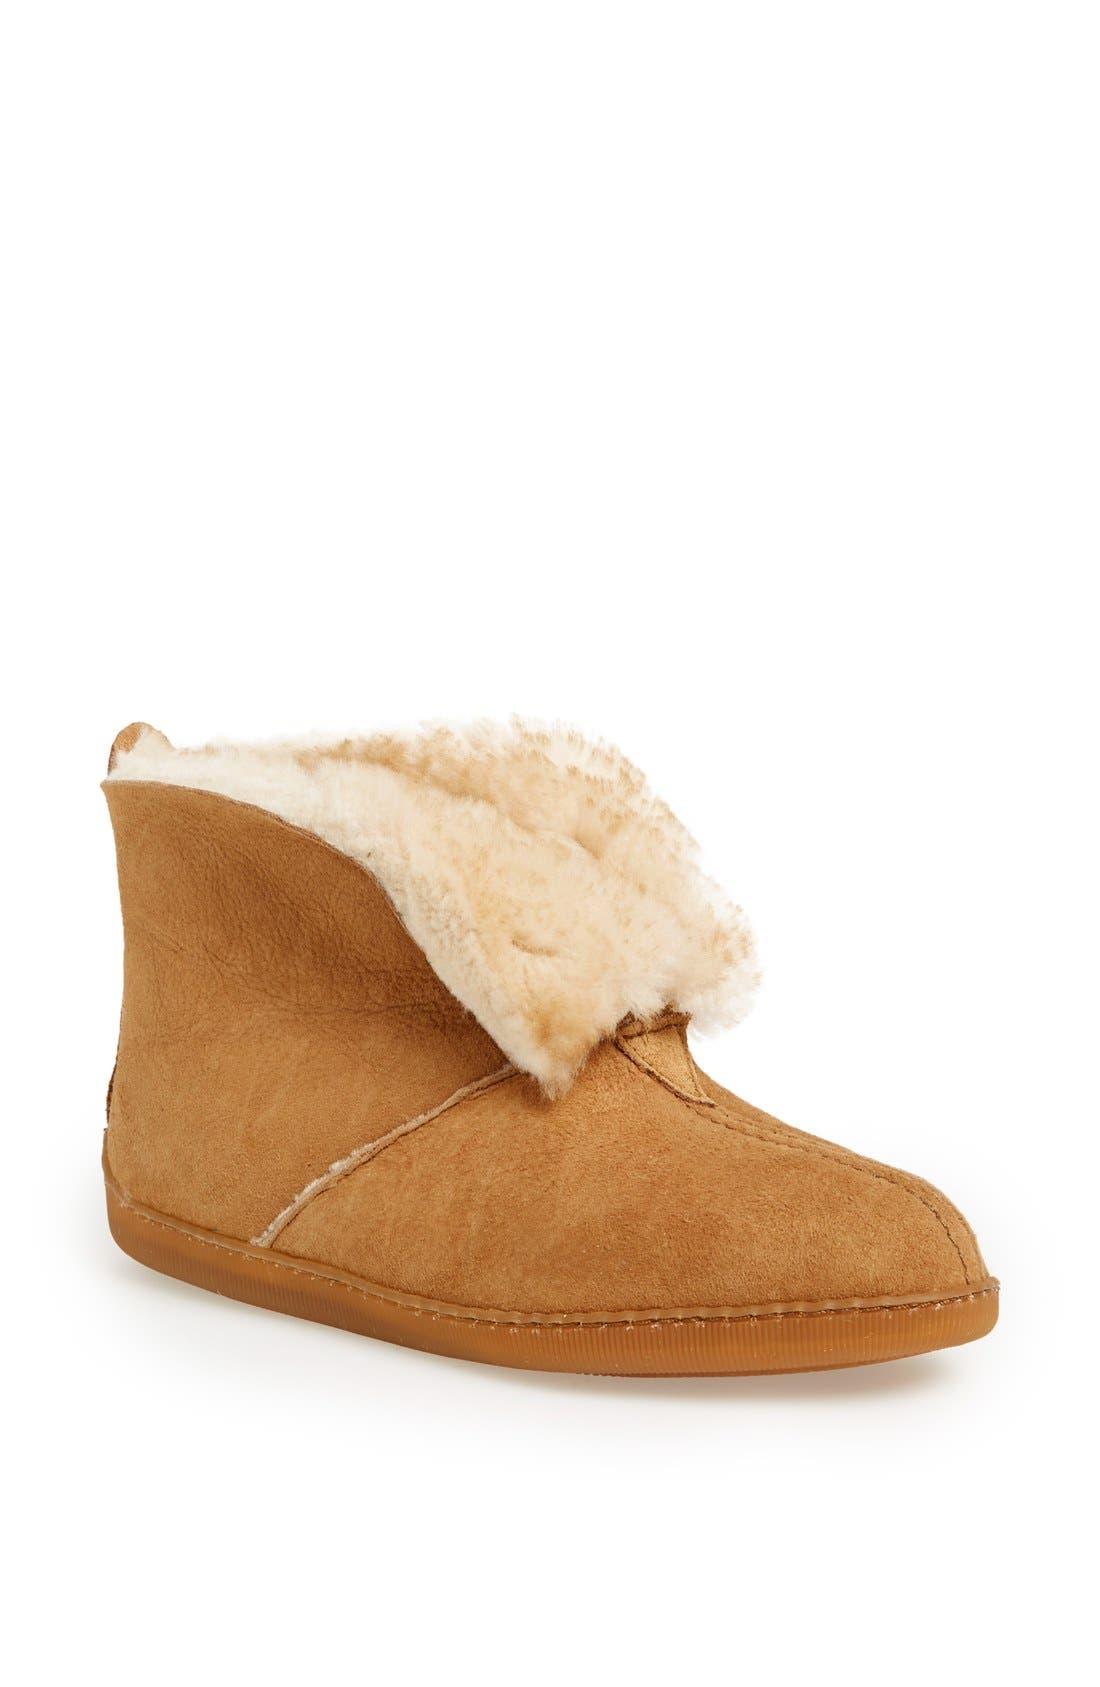 Main Image - Minnetonka Sheepskin Slipper Boot (Women)